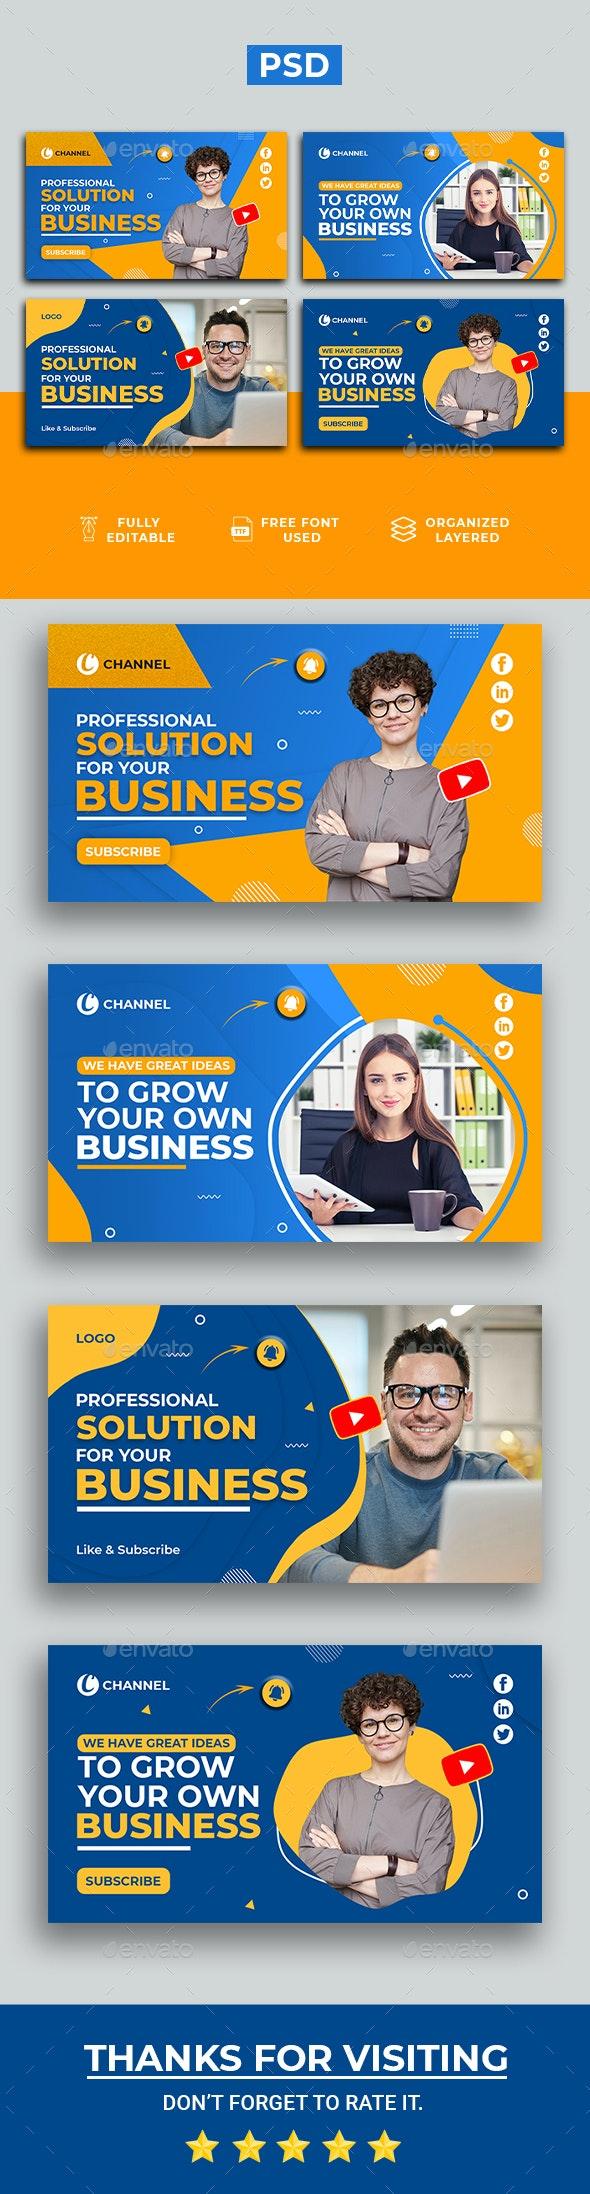 Business Youtube Thumbnail - YouTube Social Media